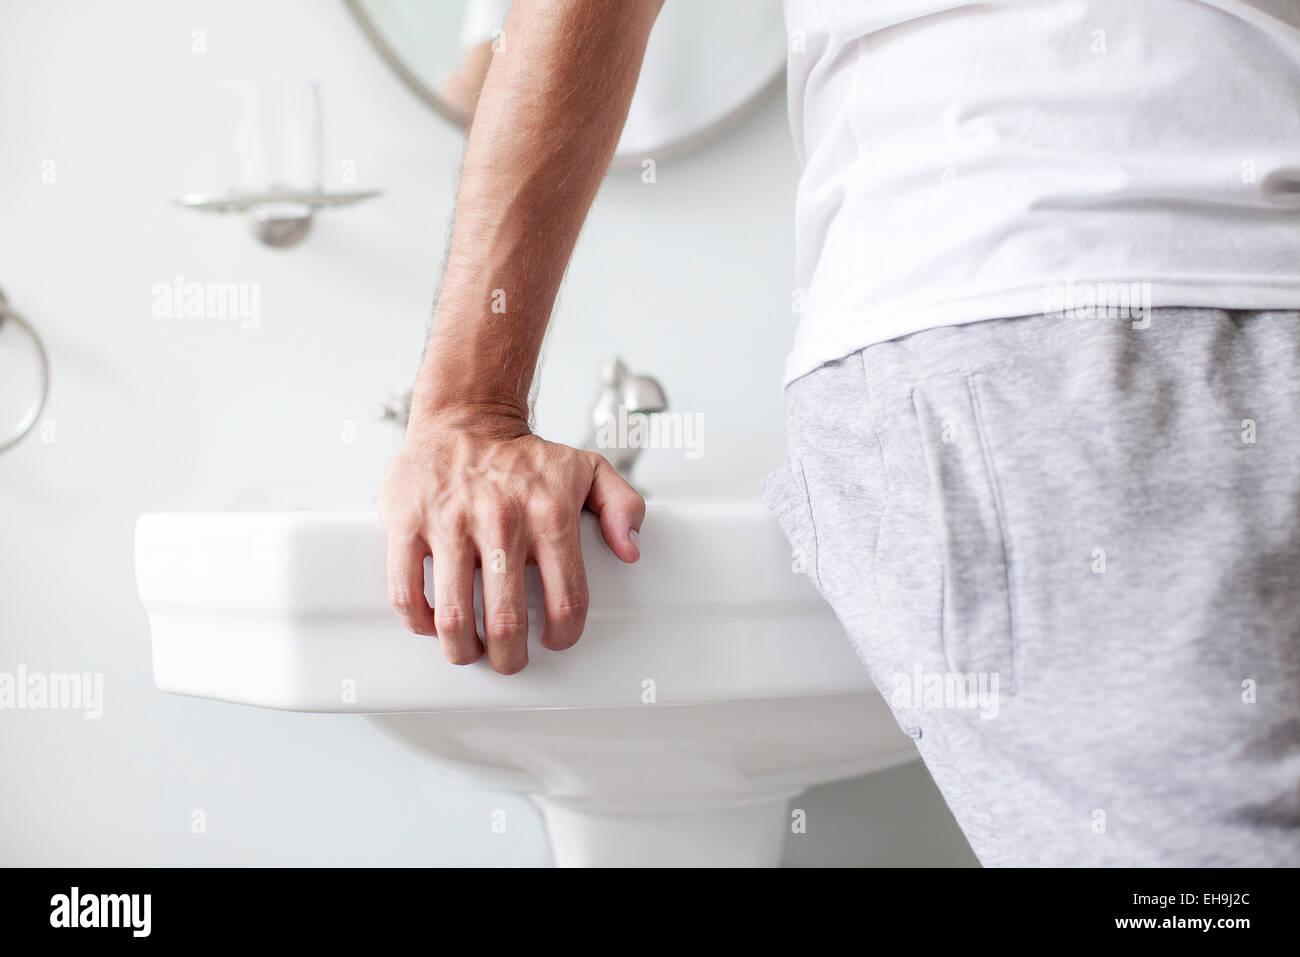 Man leaning against bathroom sink - Stock Image